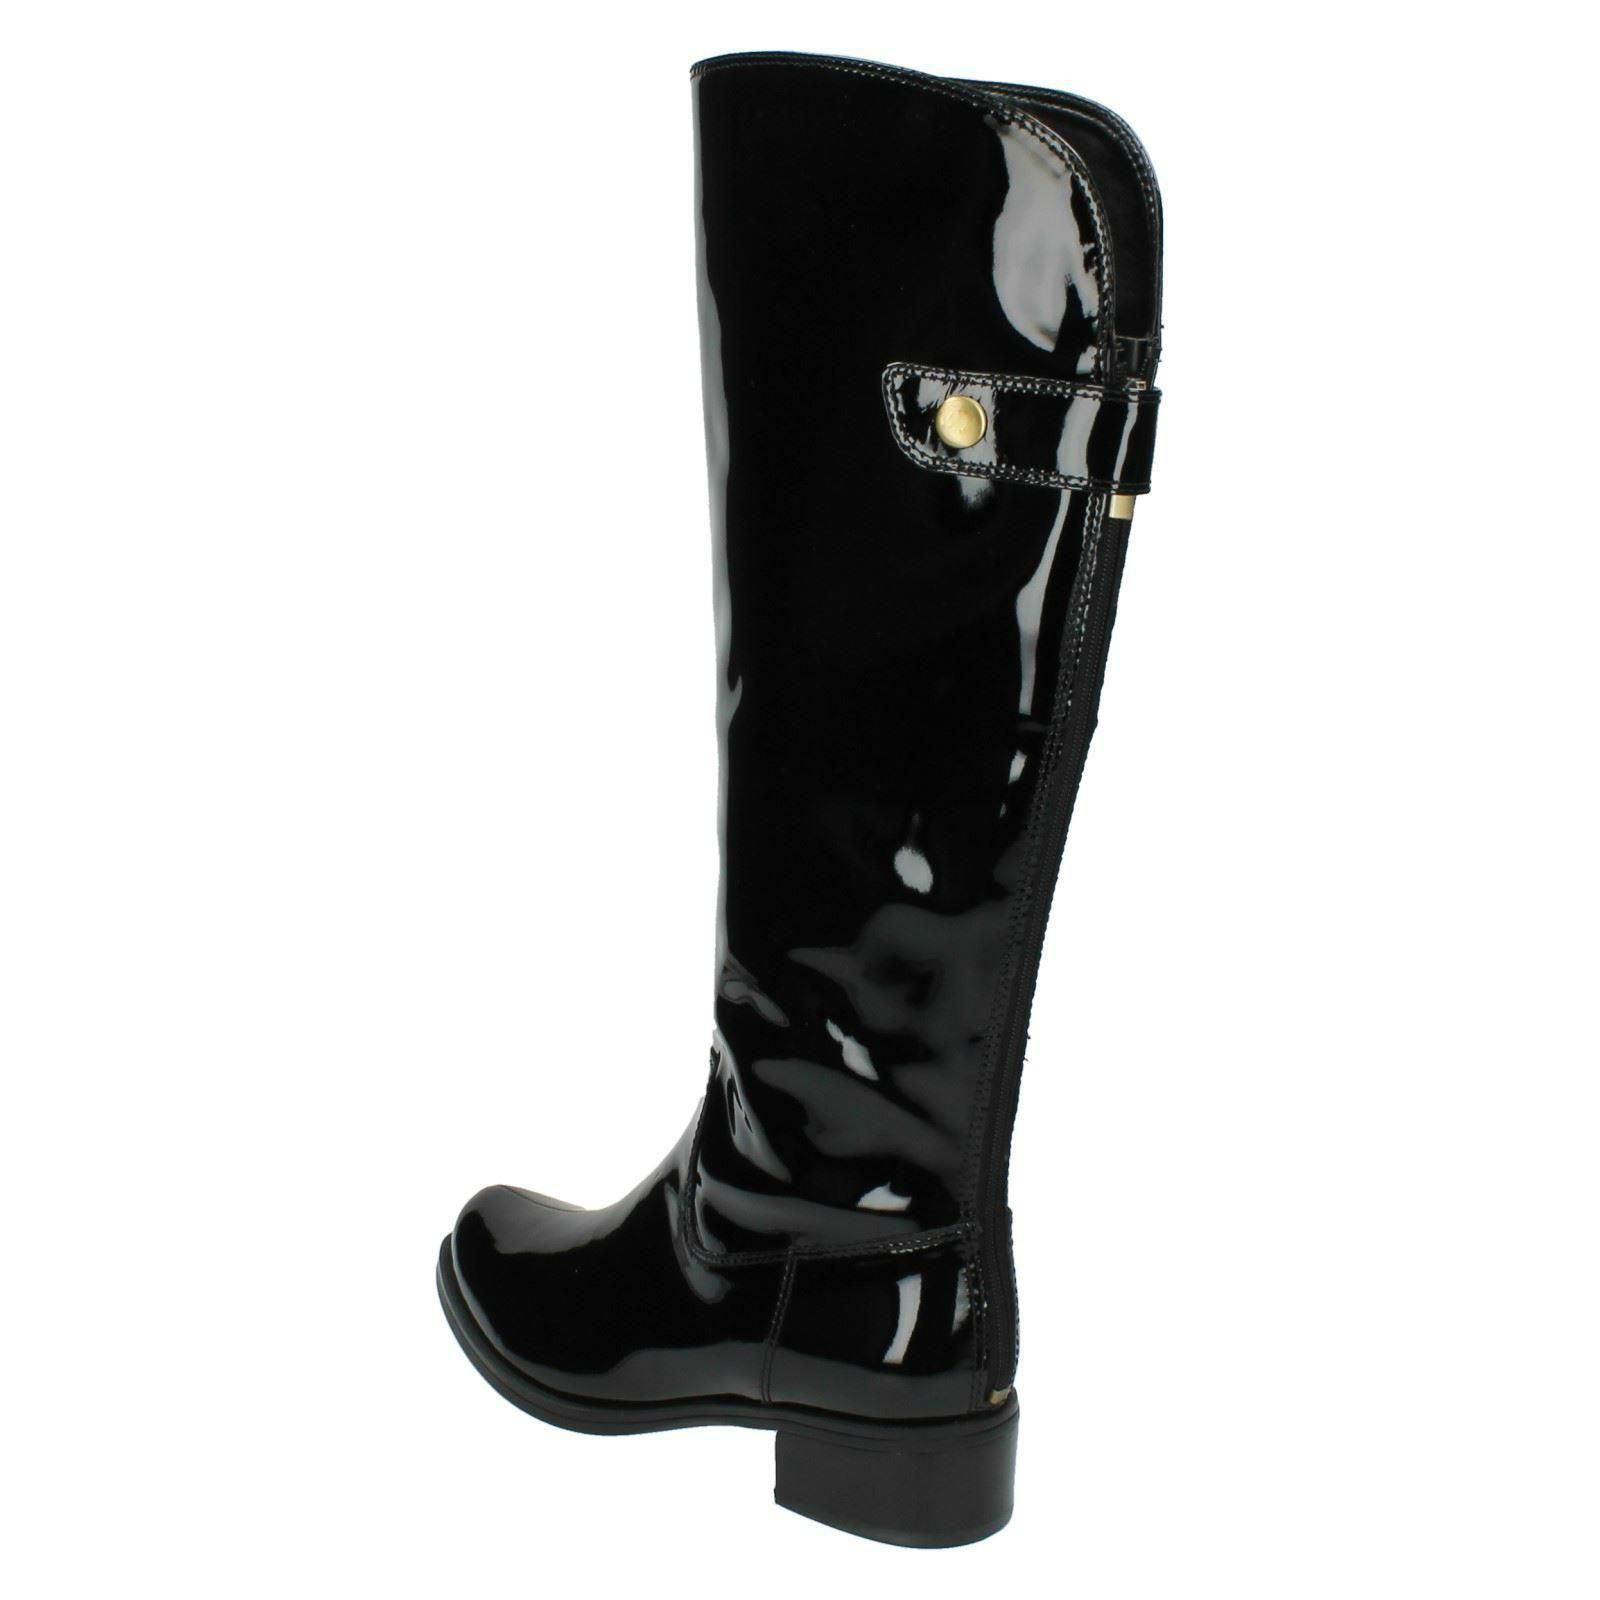 patente Señoras Kildale negro largas Clarks botas Drama formales zzRaw0Zq